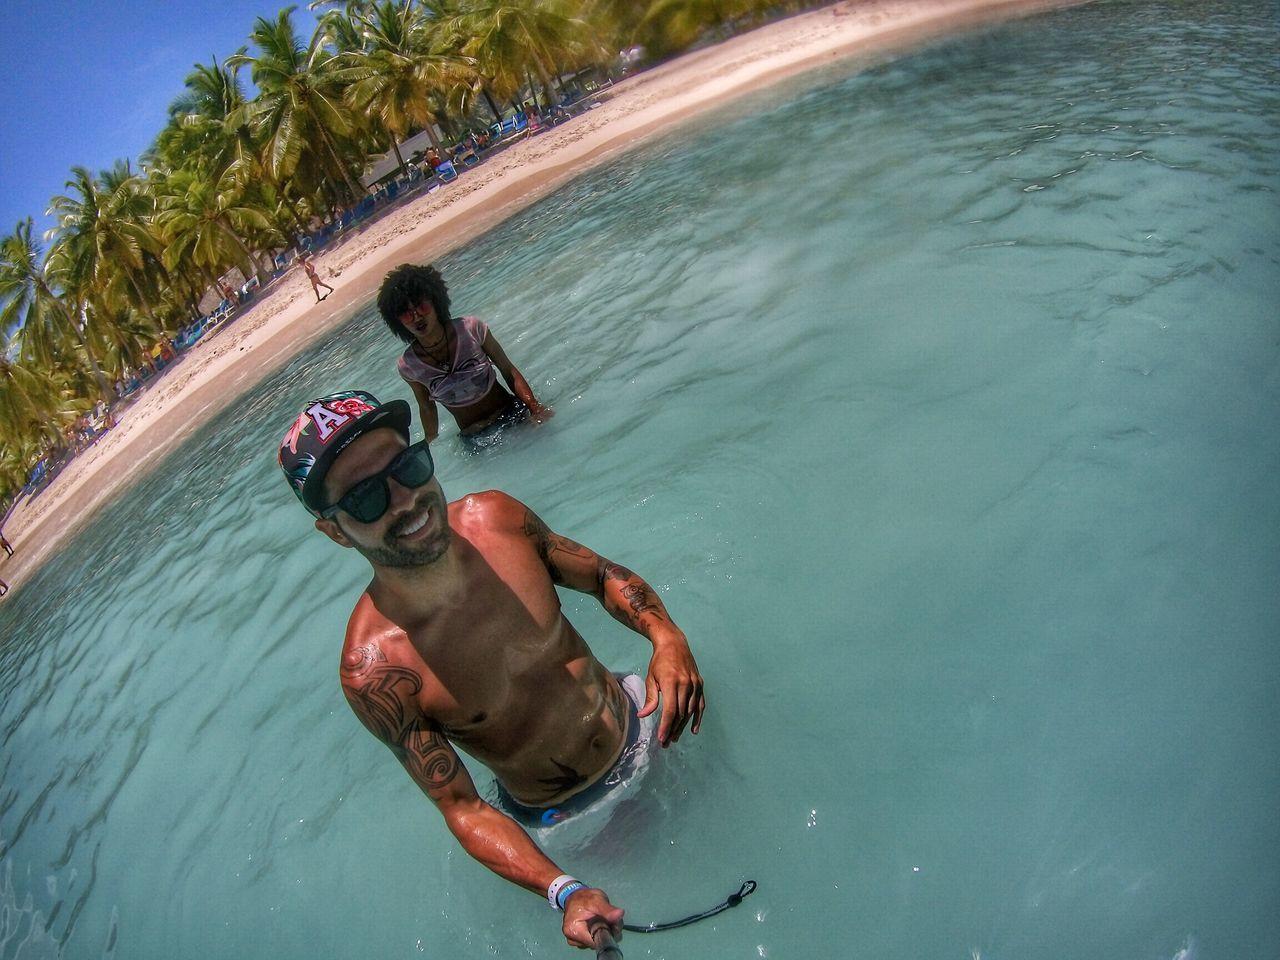 Islasaona Republicadominicana Dominicanrepublic Puntacana Mamajuana Beach Paraíso Paradise